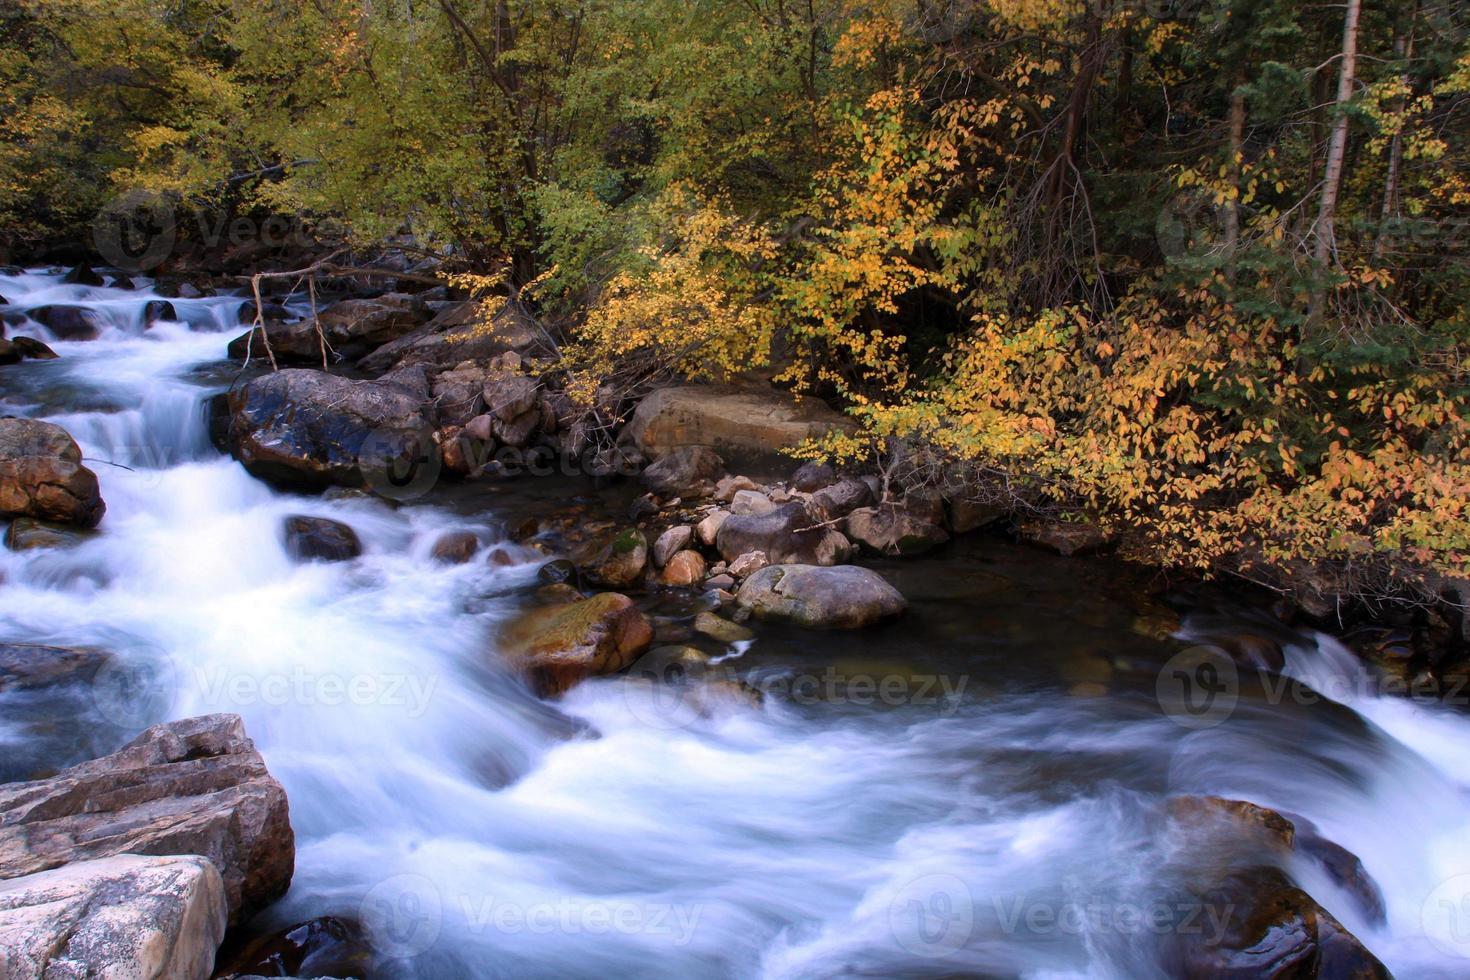 stromend water stroom, utah bergen vallen kleur snelle rivier foto